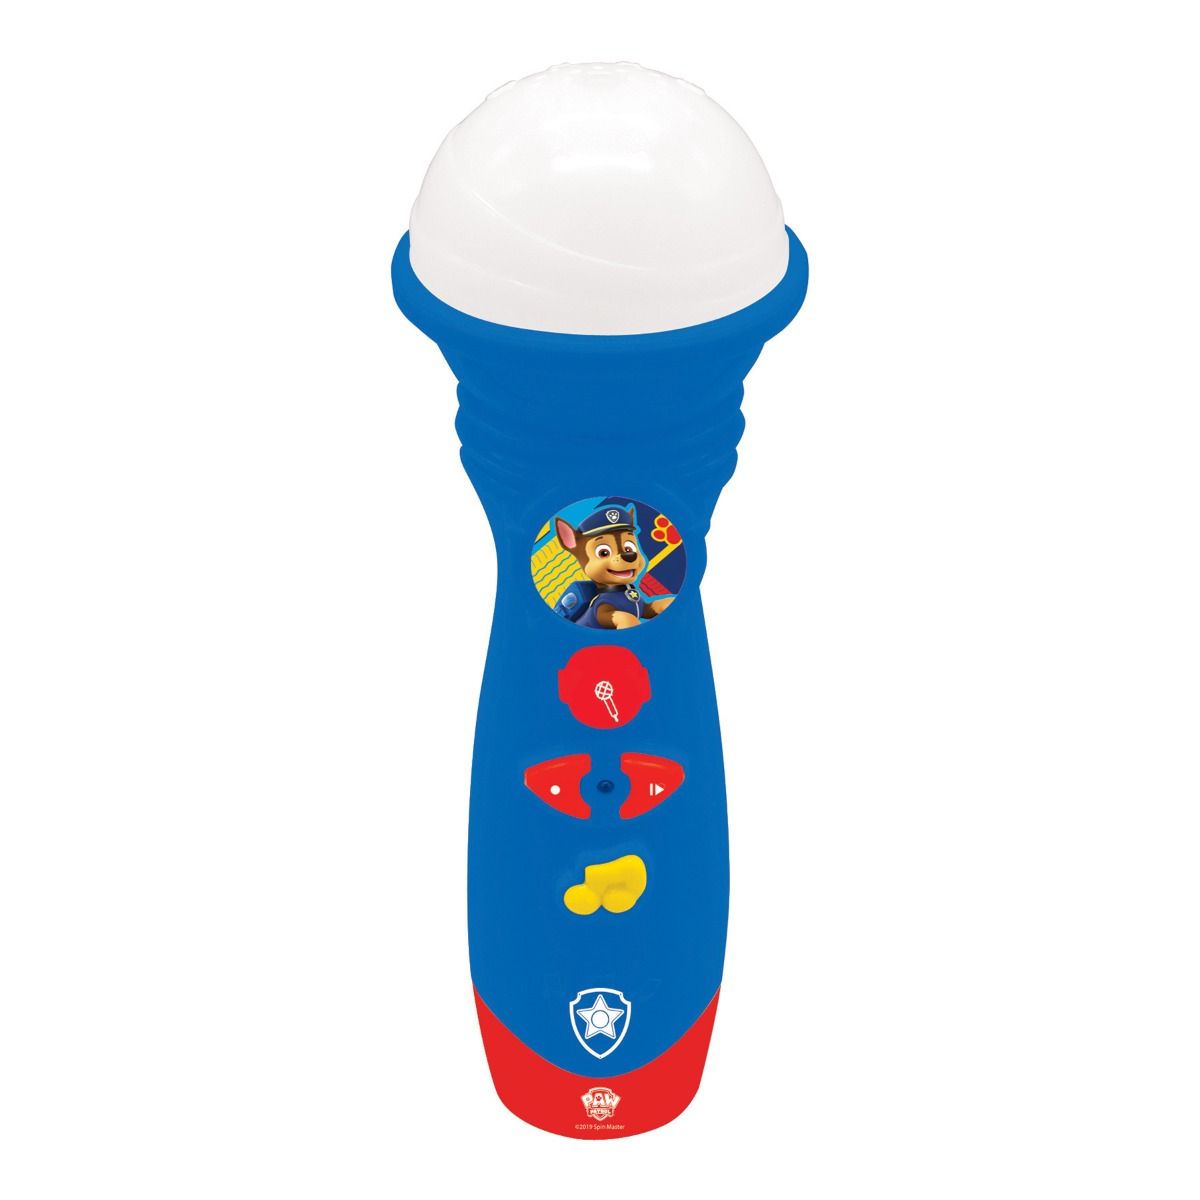 Primul meu microfon cu functie de inregistrare si melodii, Paw Patrol